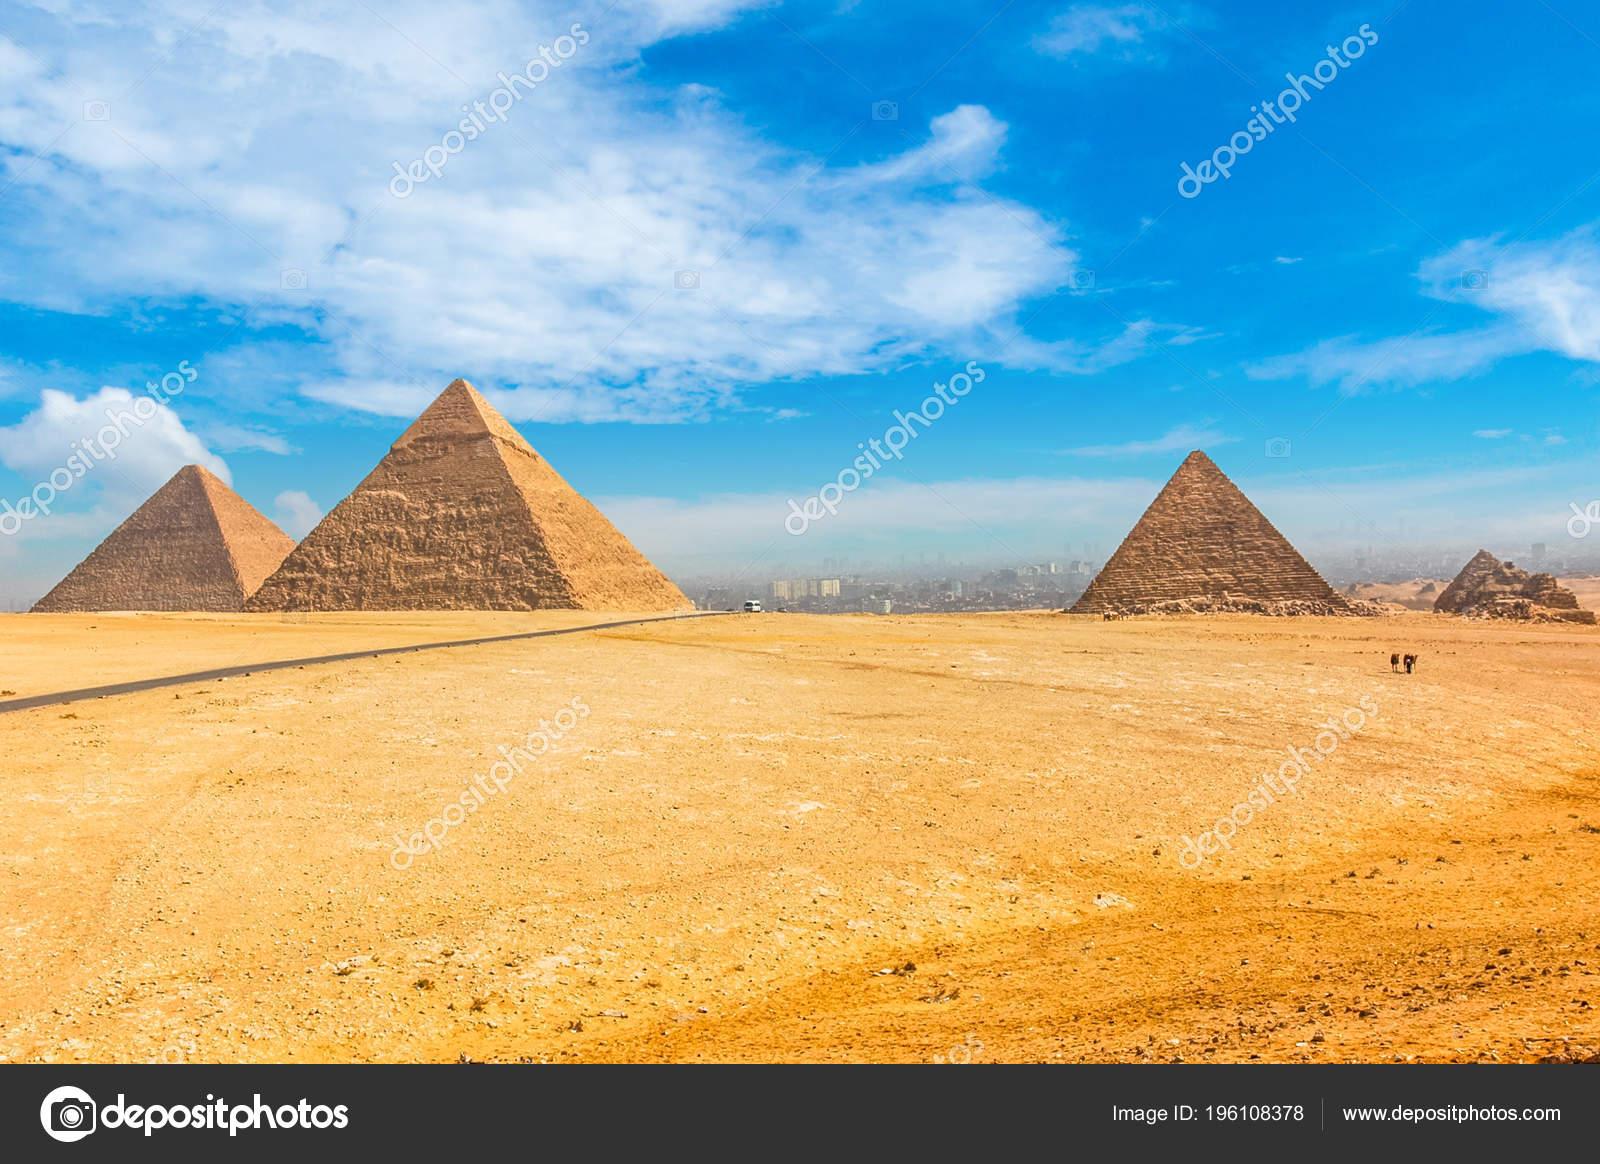 Pyramid wallpaper   Egyptian Pyramids Giza Background Cairo